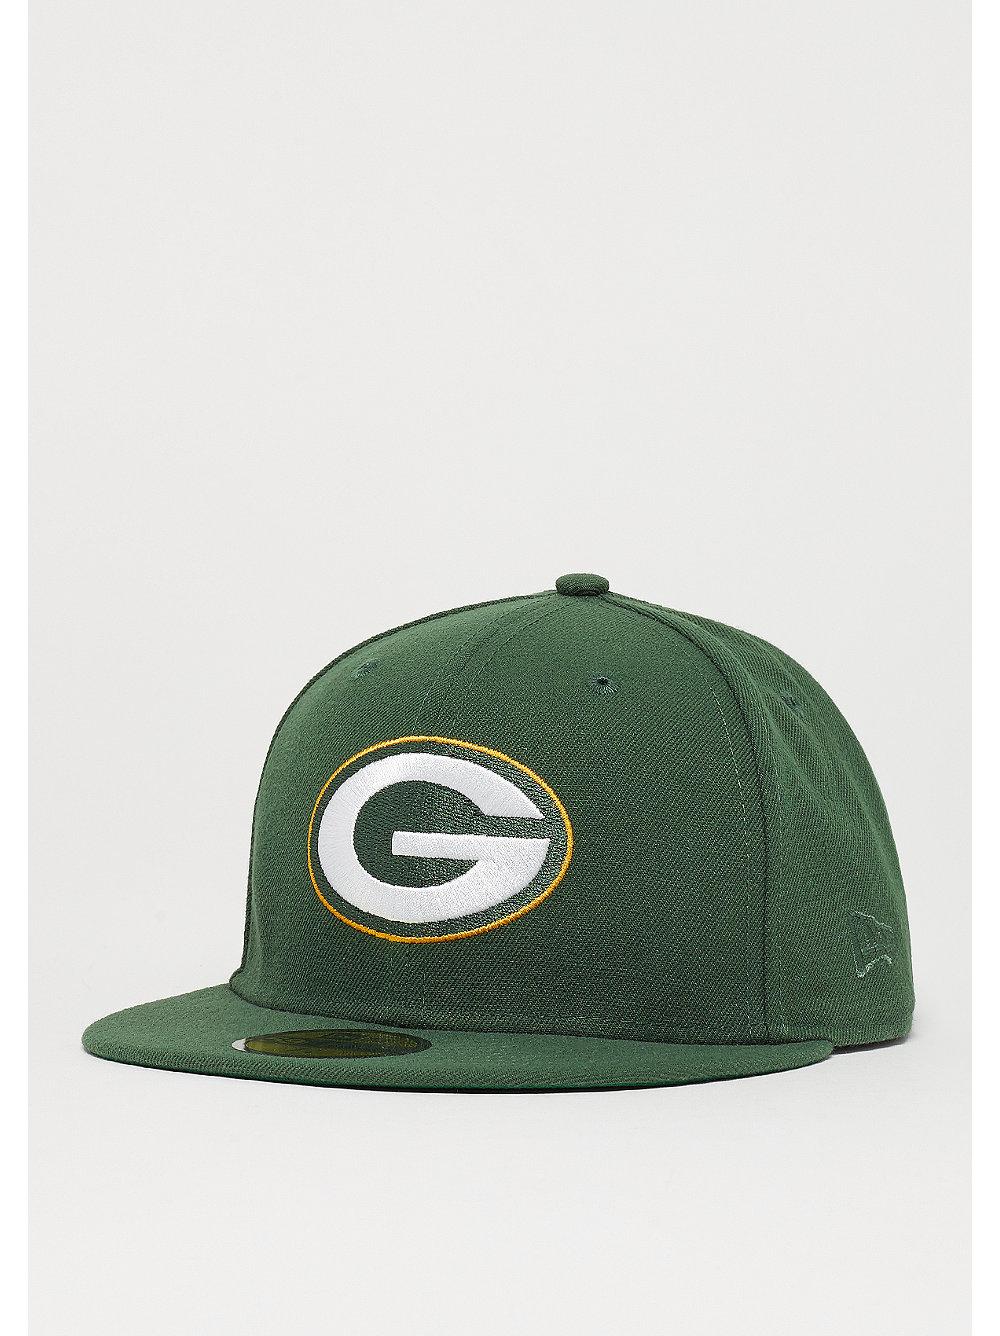 c616a6d7e001b Gorra New Era 59Fifty NFL Green Bay Packers Classic en SNIPES